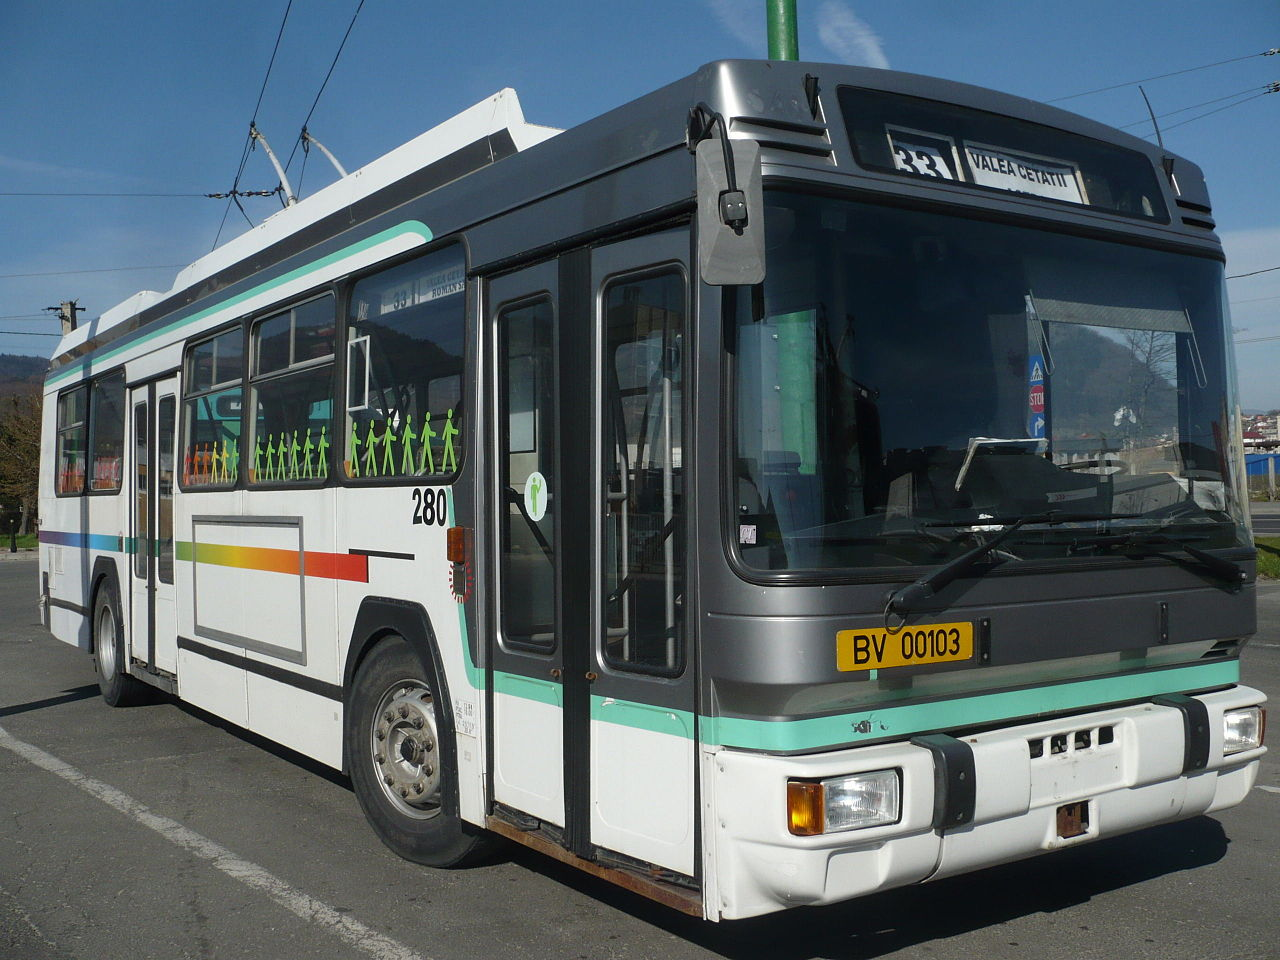 file renault trolleybus 280 wikimedia commons. Black Bedroom Furniture Sets. Home Design Ideas